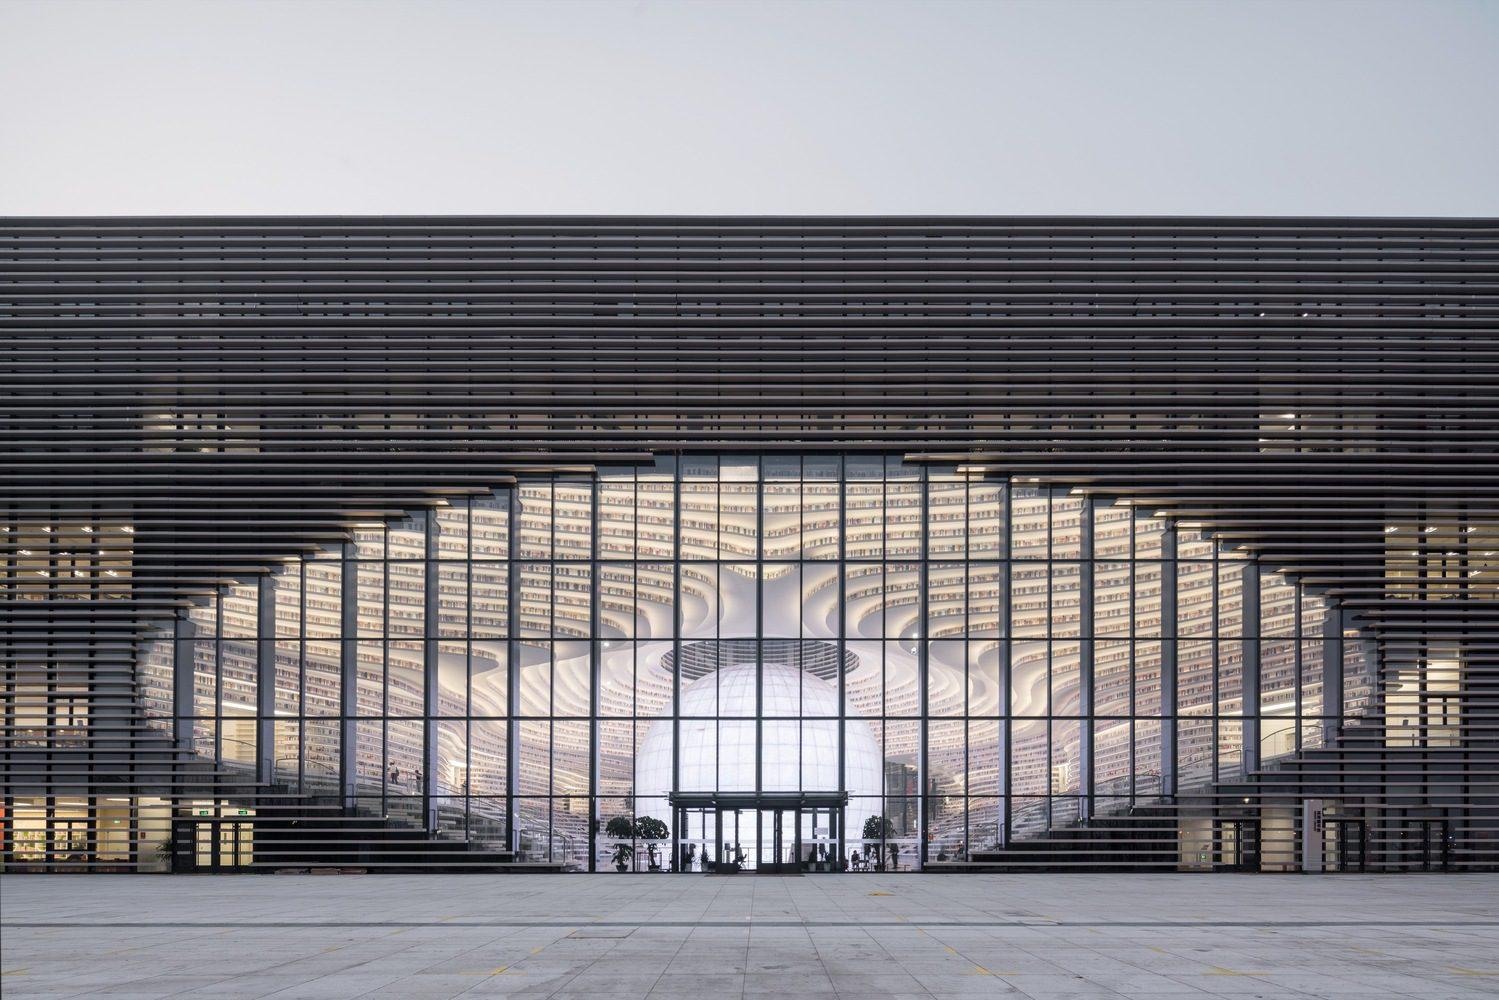 MVRDV - Tianjin Binhai Library - Ossip - IGS Magazine - Projects - 2